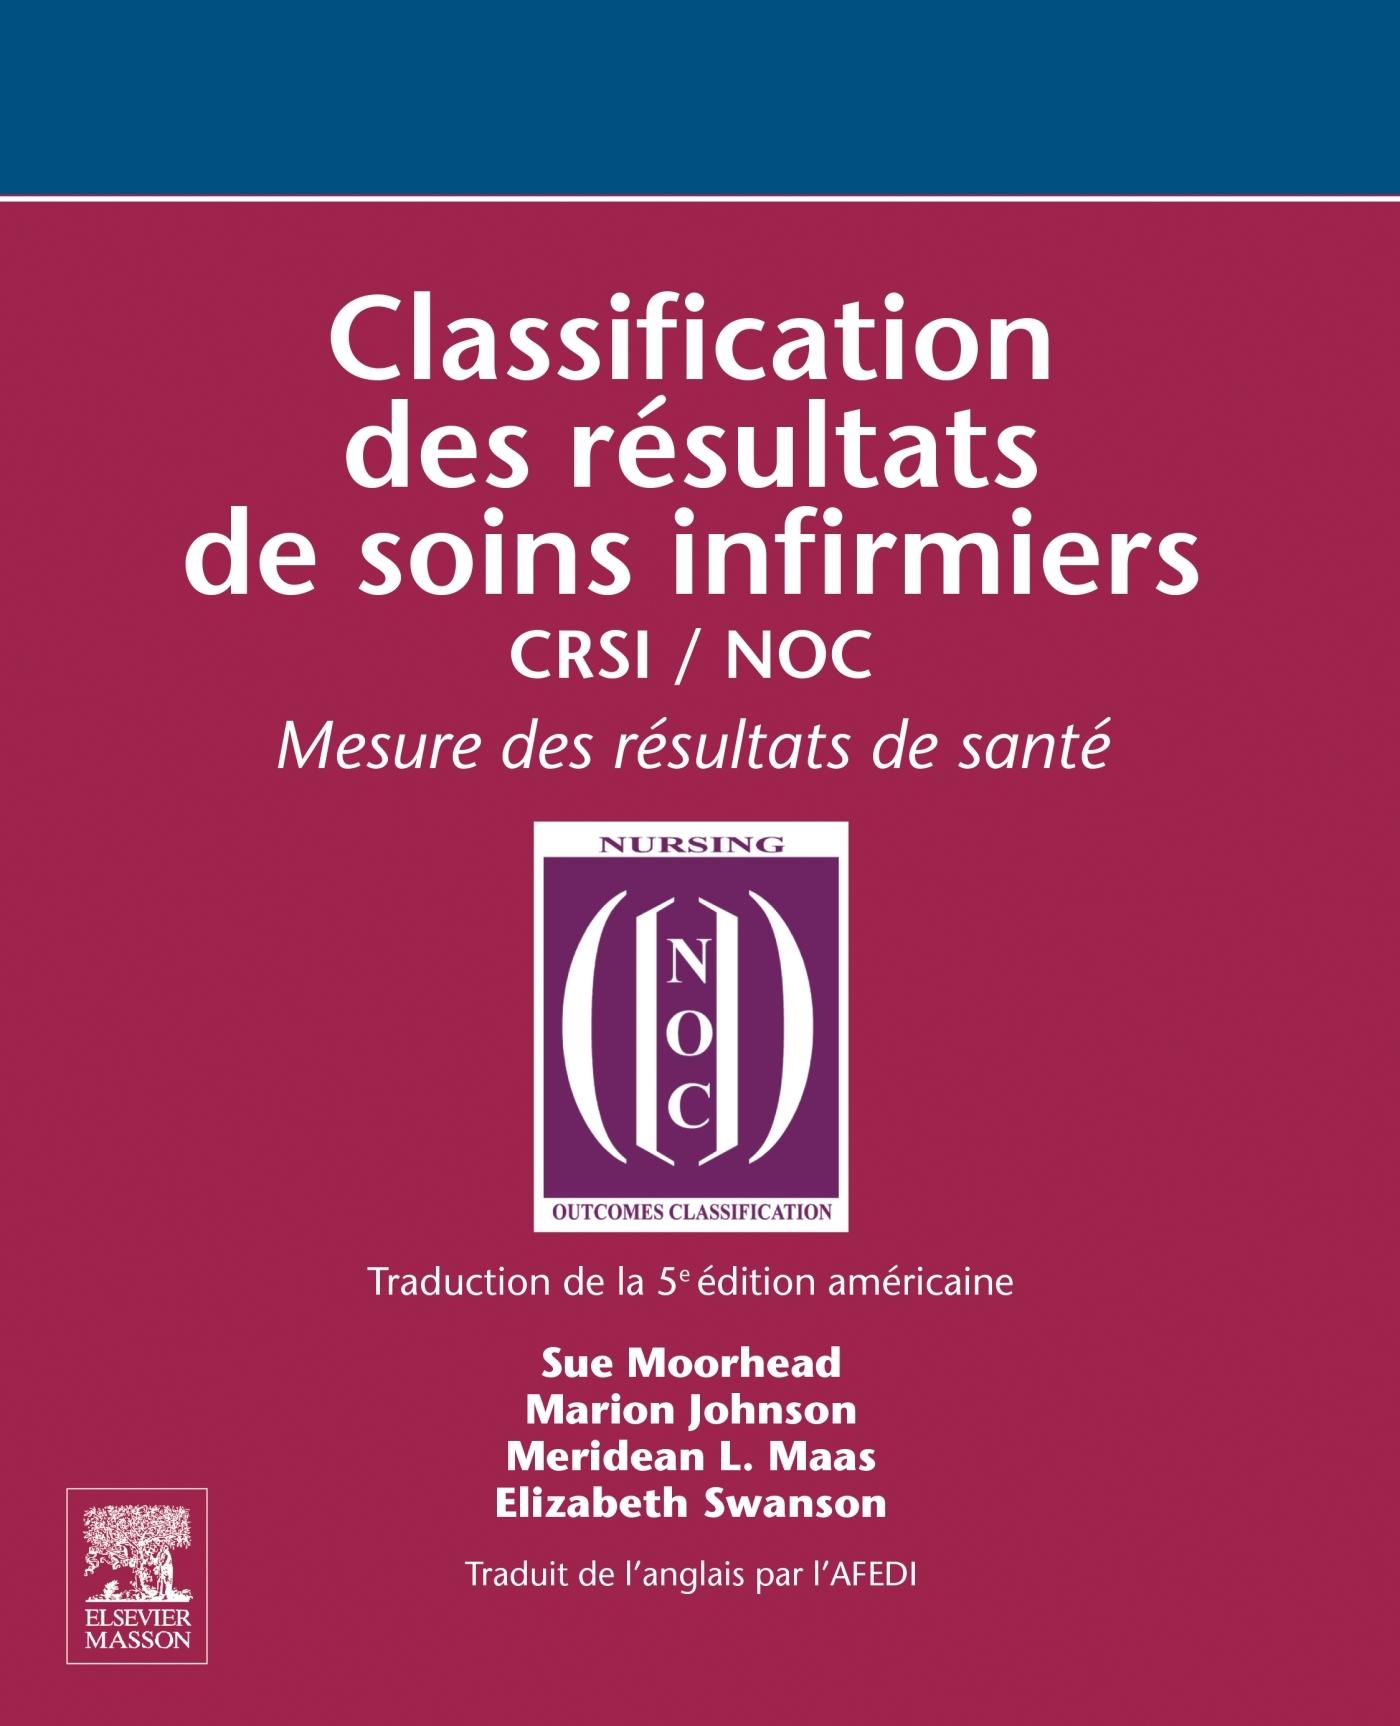 CLASSIFICATION DES RESULTATS DE SOINS INFIRMIERS - CRSI / NOC